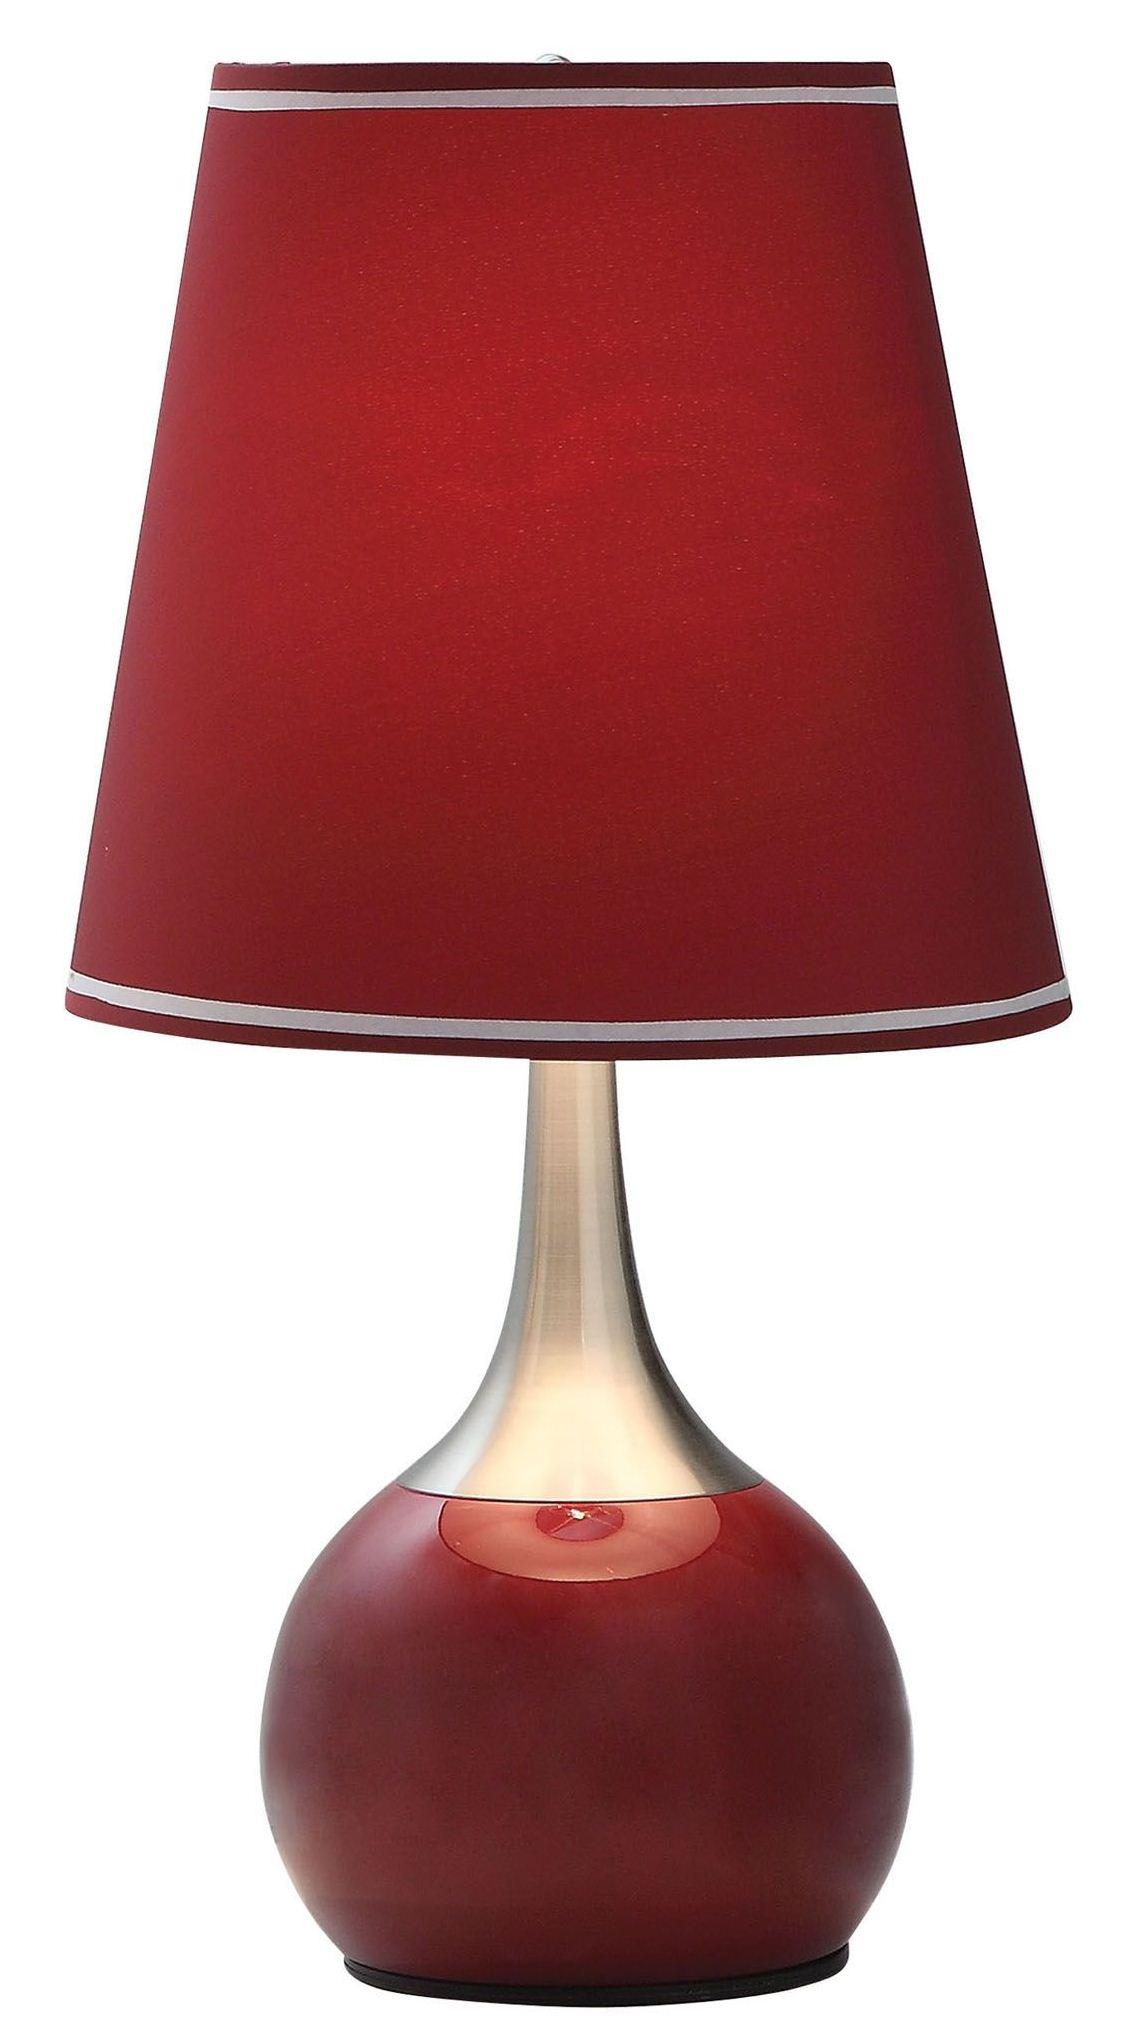 Furniture Of America Burgundy Touch Lamp Burgundy